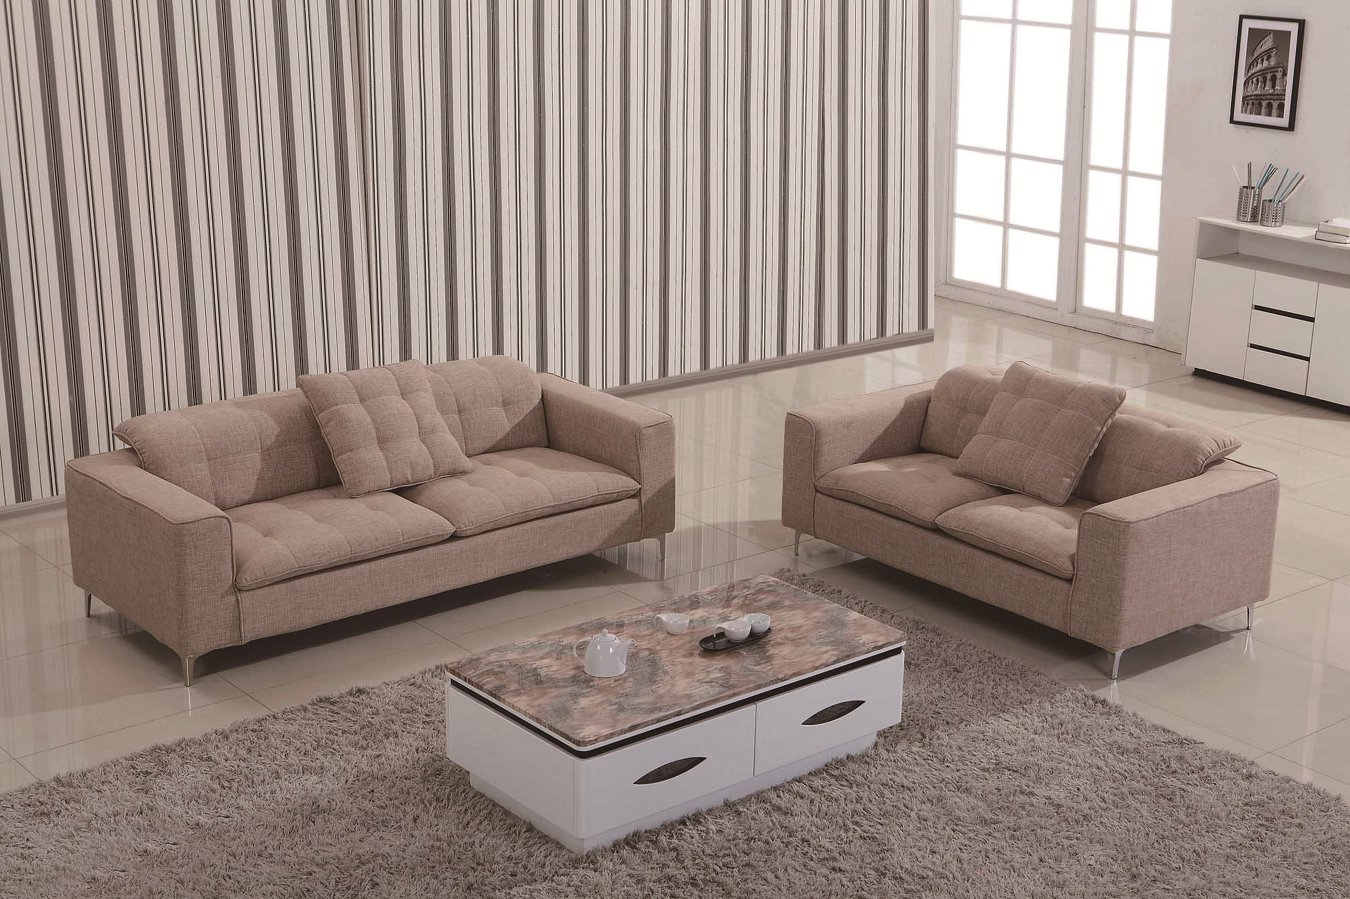 2017 Lizz Furniture Sectional Fabric Sofa